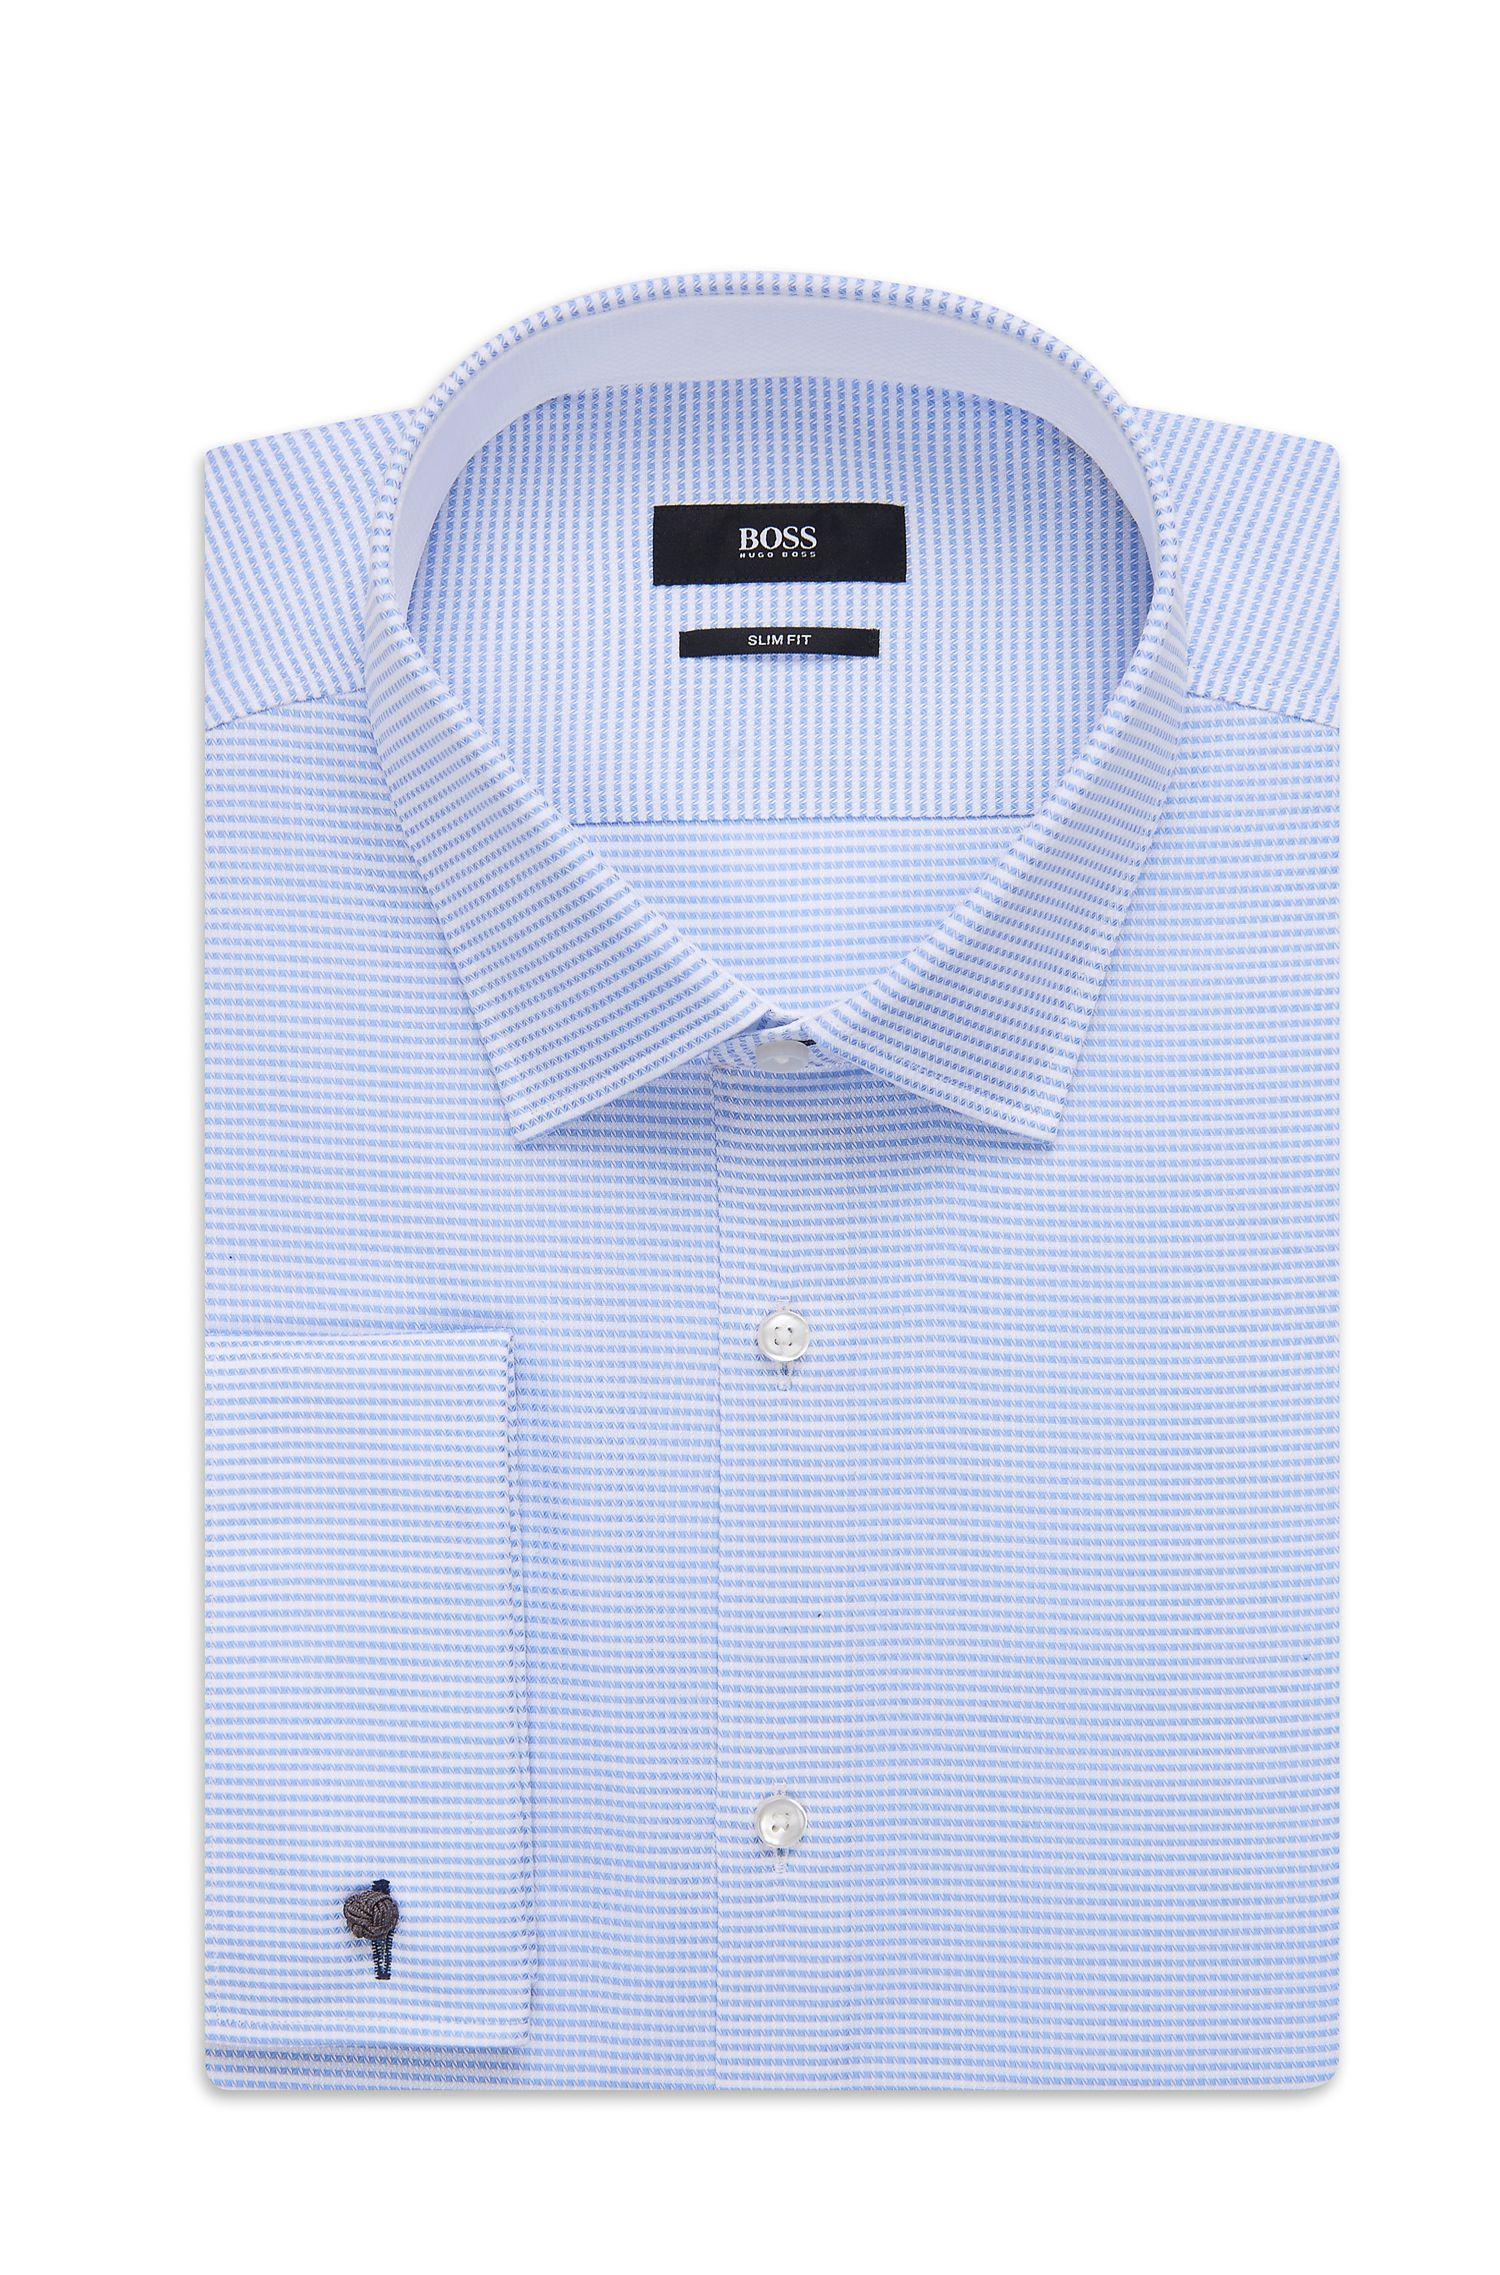 'Jac' | Slim Fit, Italian Cotton Patterned Dress Shirt